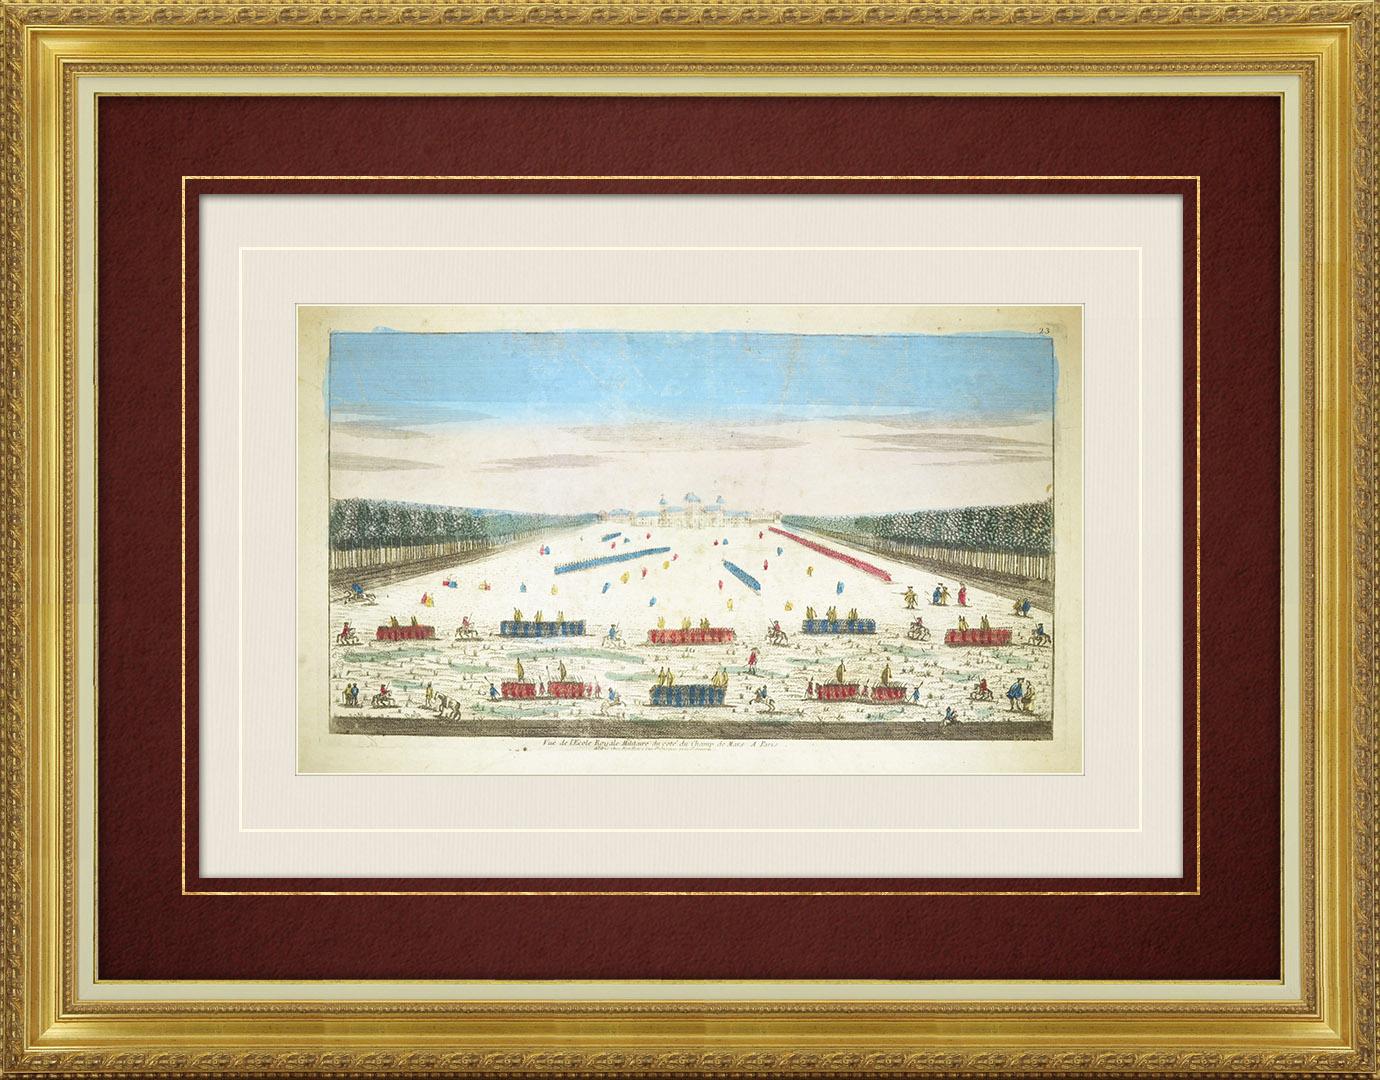 18th Century optical view in original watercolors of the Military School - Champ-de-Mars - Paris (France)